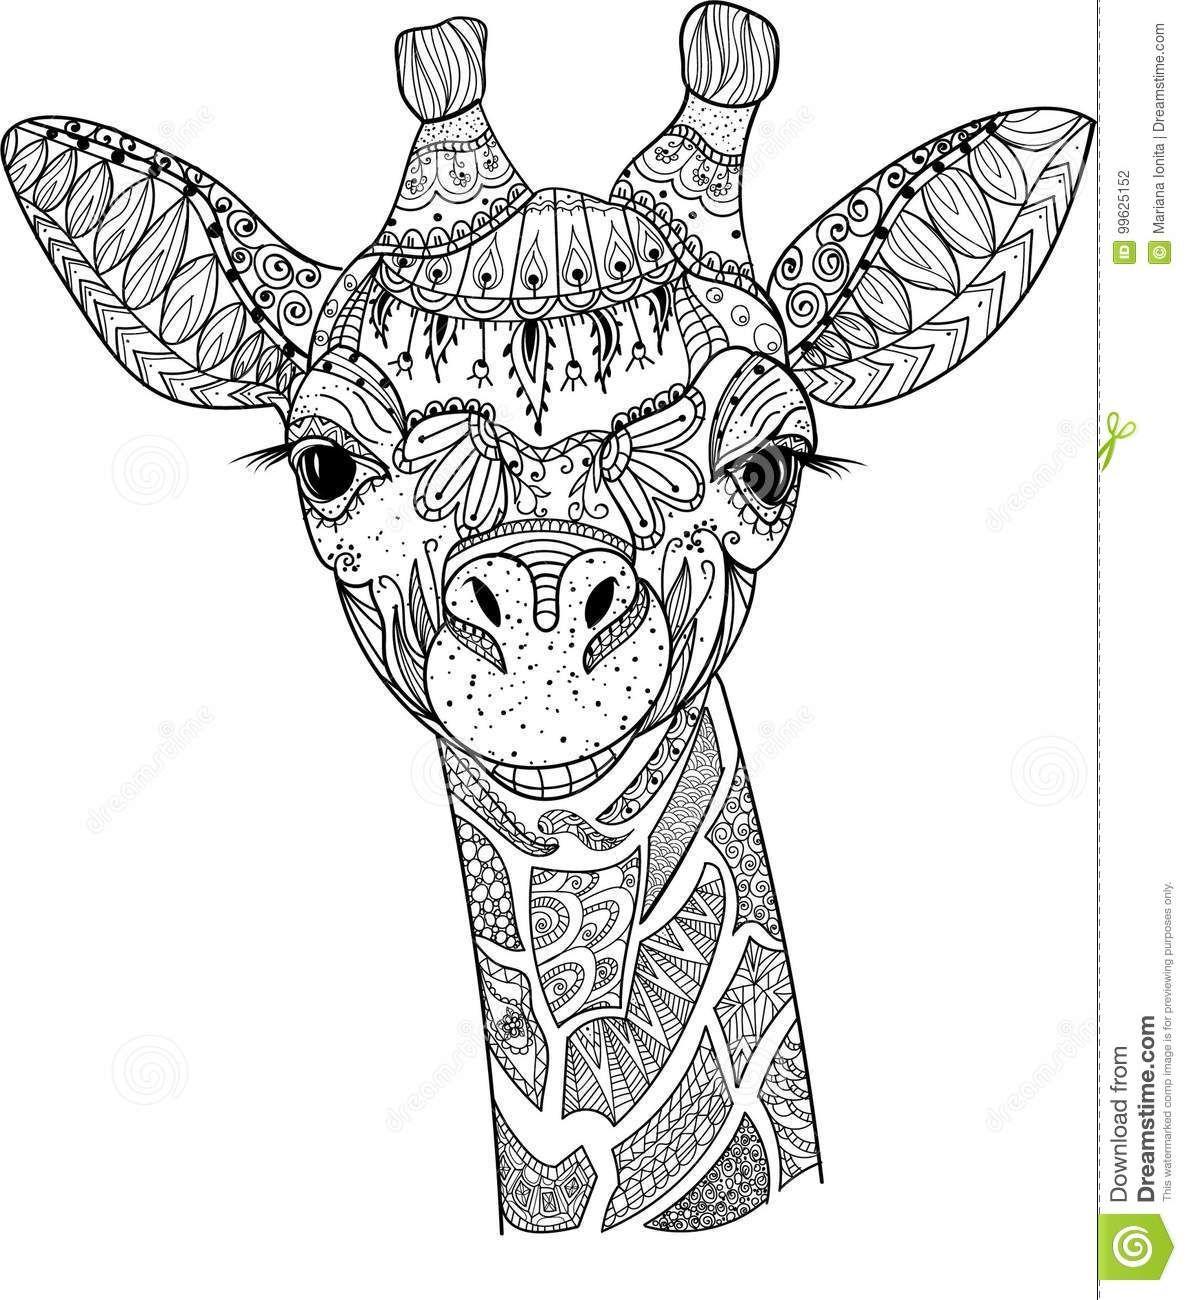 Zentangle giraffe stock vector. Illustration of decoration